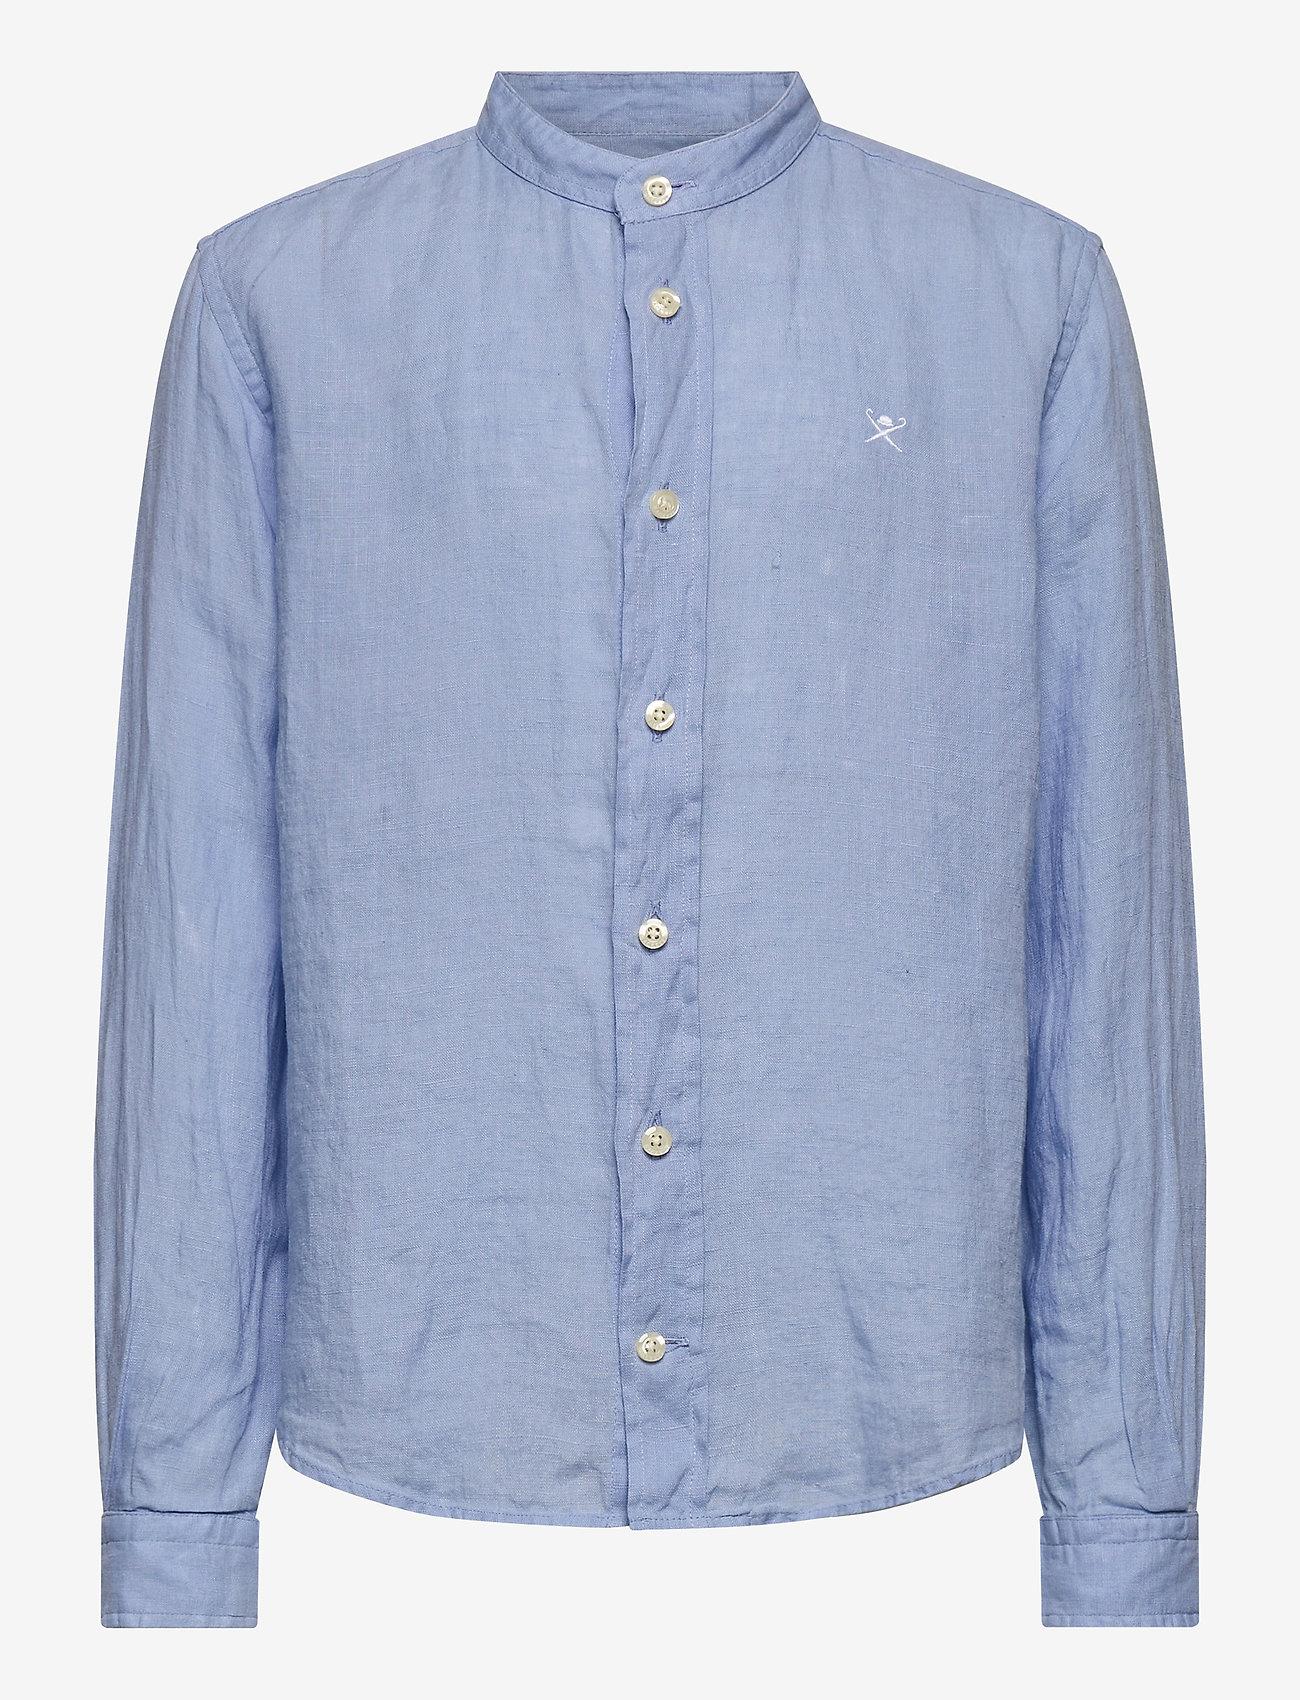 Hackett London - PLAIN LINEN Y - shirts - 513sky - 0